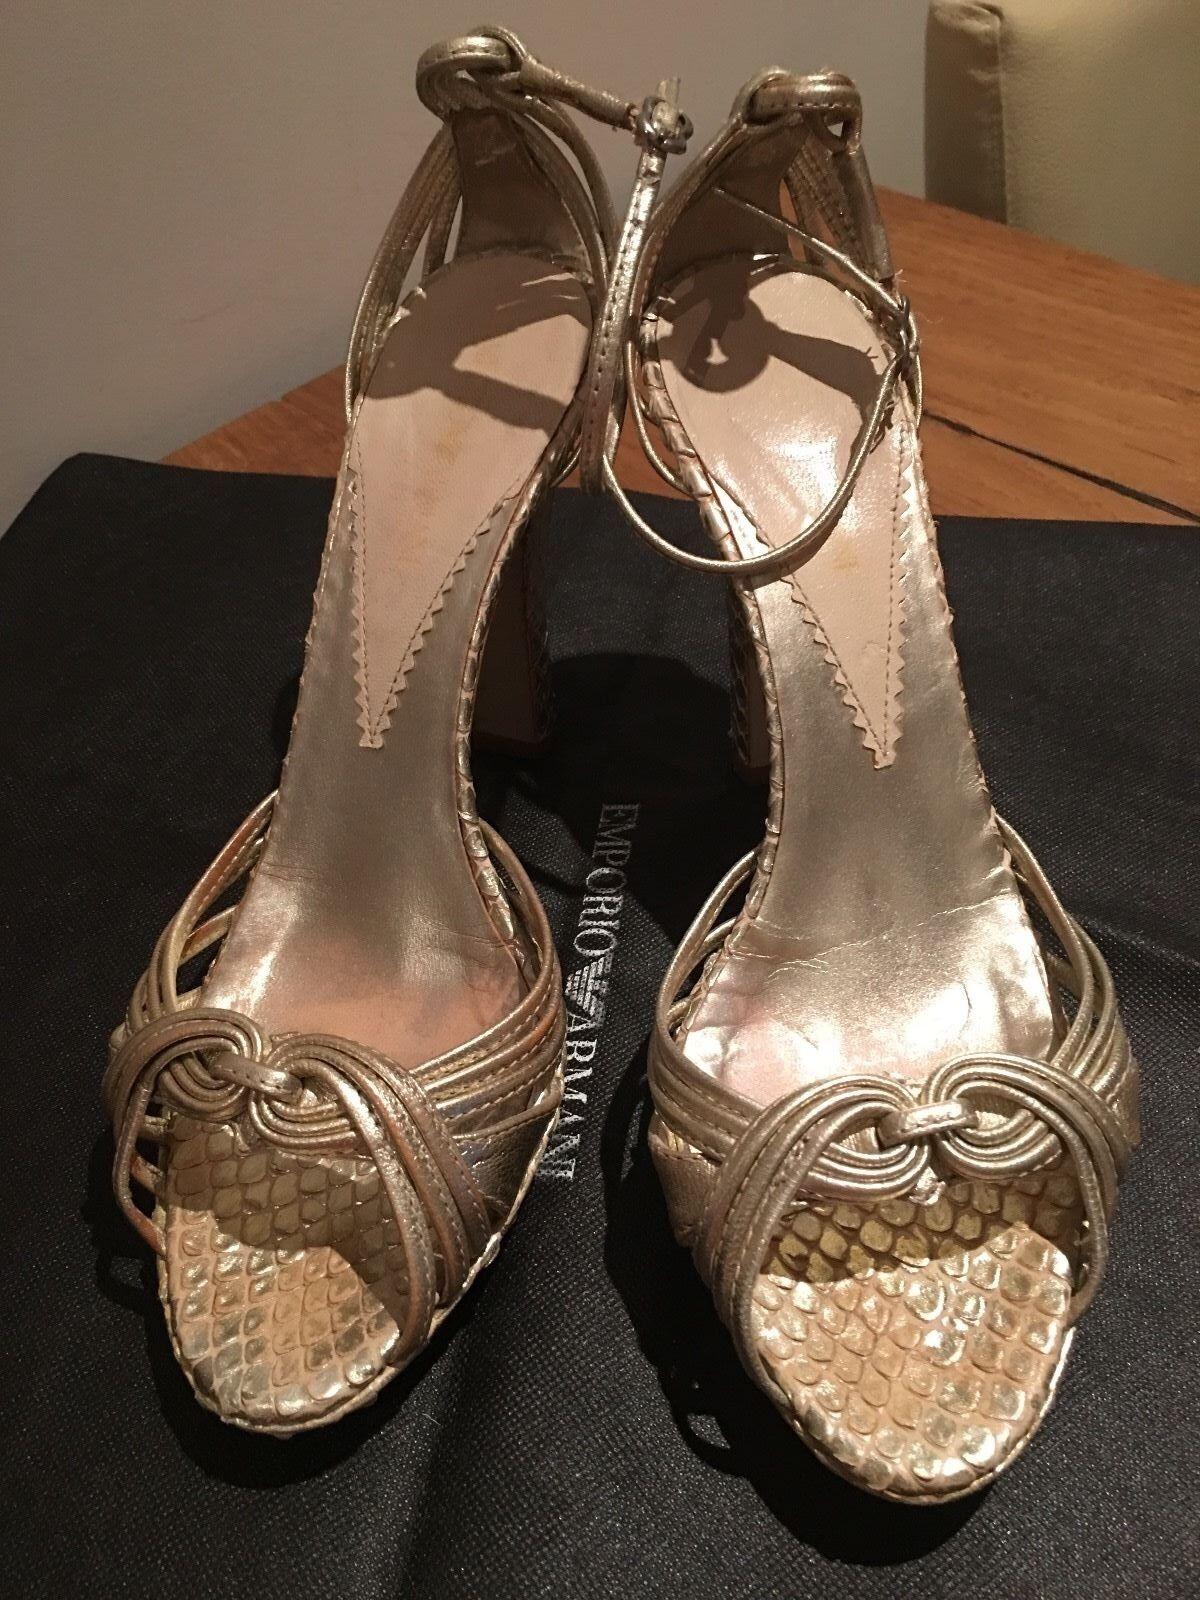 Vackra Armani guld Piton läder skor, Storlek Storlek Storlek EU37.5, UK4.5  officiellt godkännande